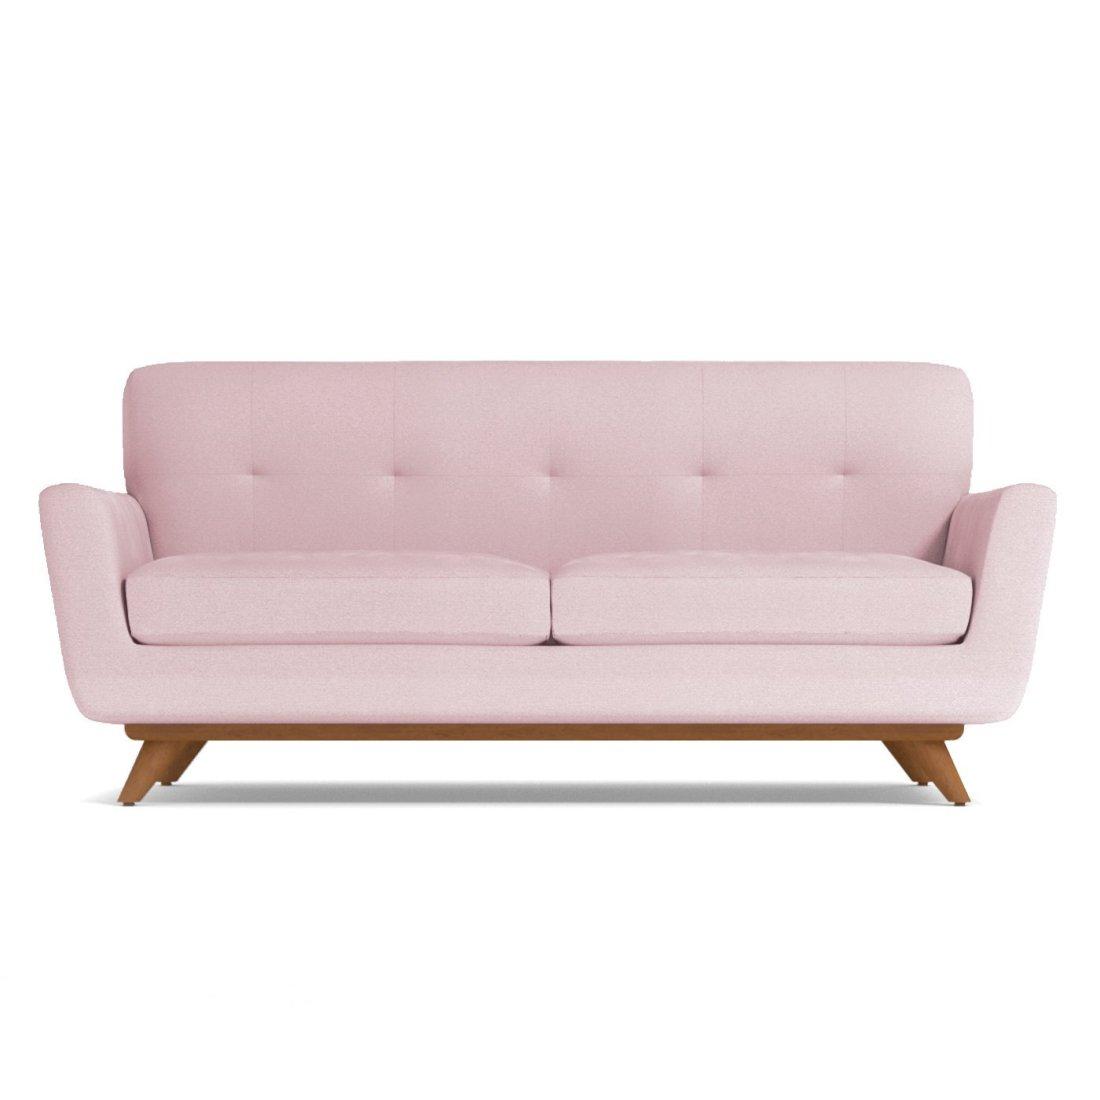 Terrific The Best Sofas For Small Spaces City Chic Decor Short Links Chair Design For Home Short Linksinfo